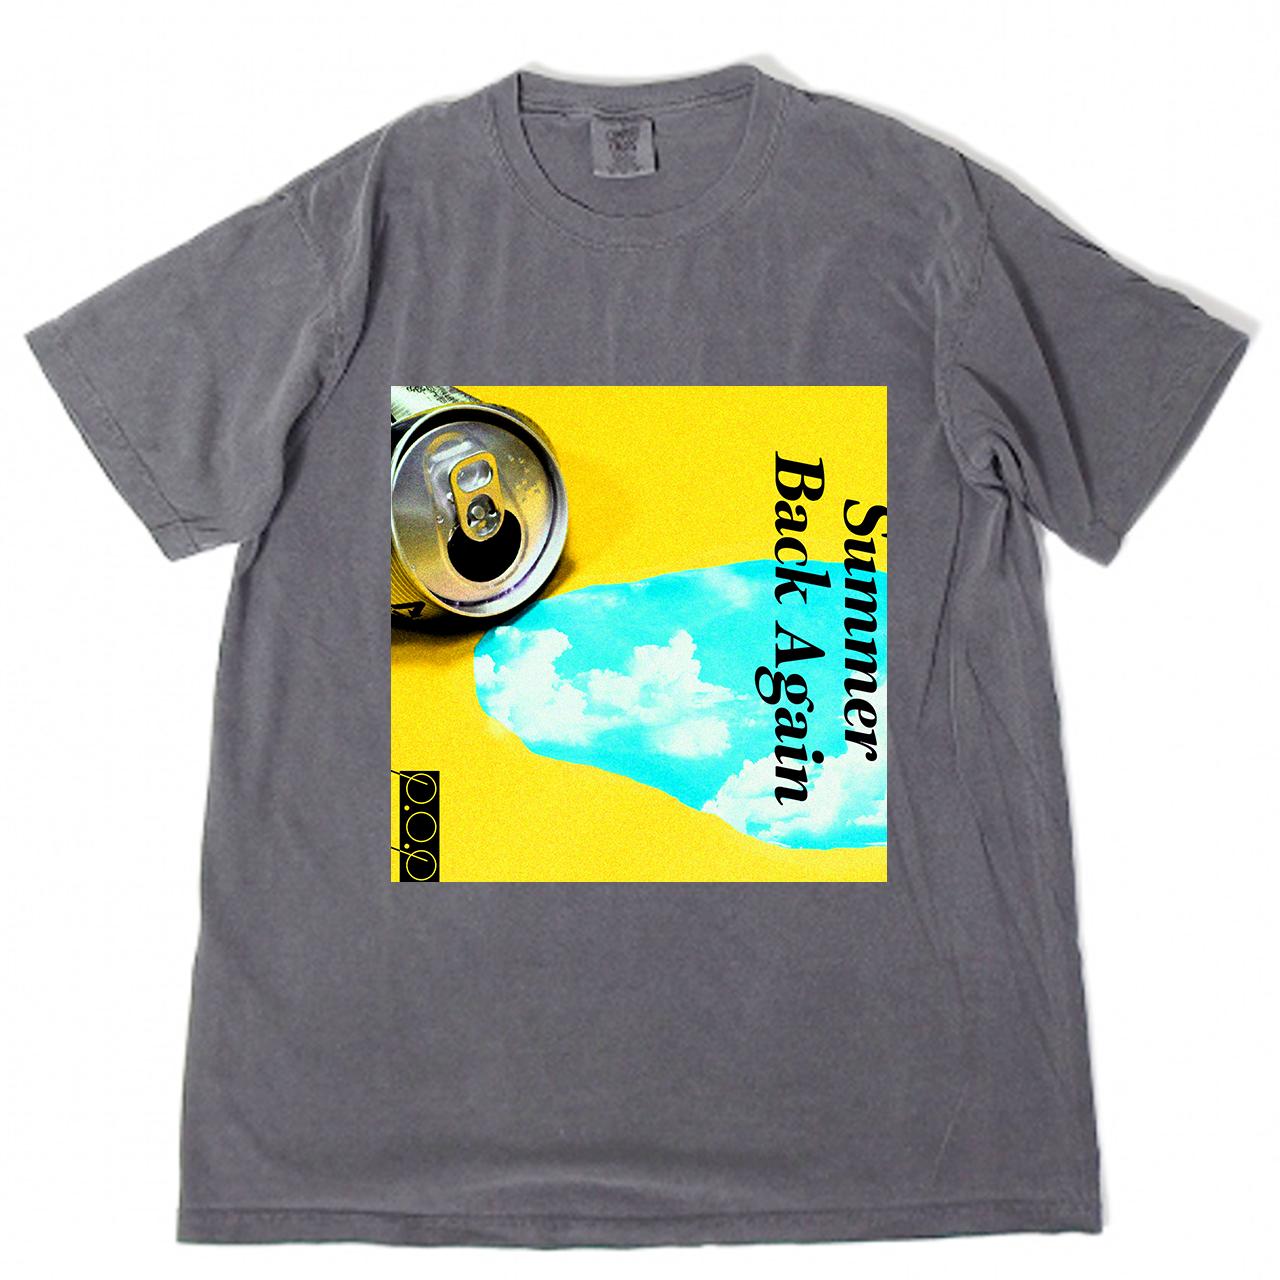 SUMMER BACK AGAIN Tシャツ グレー - 画像1